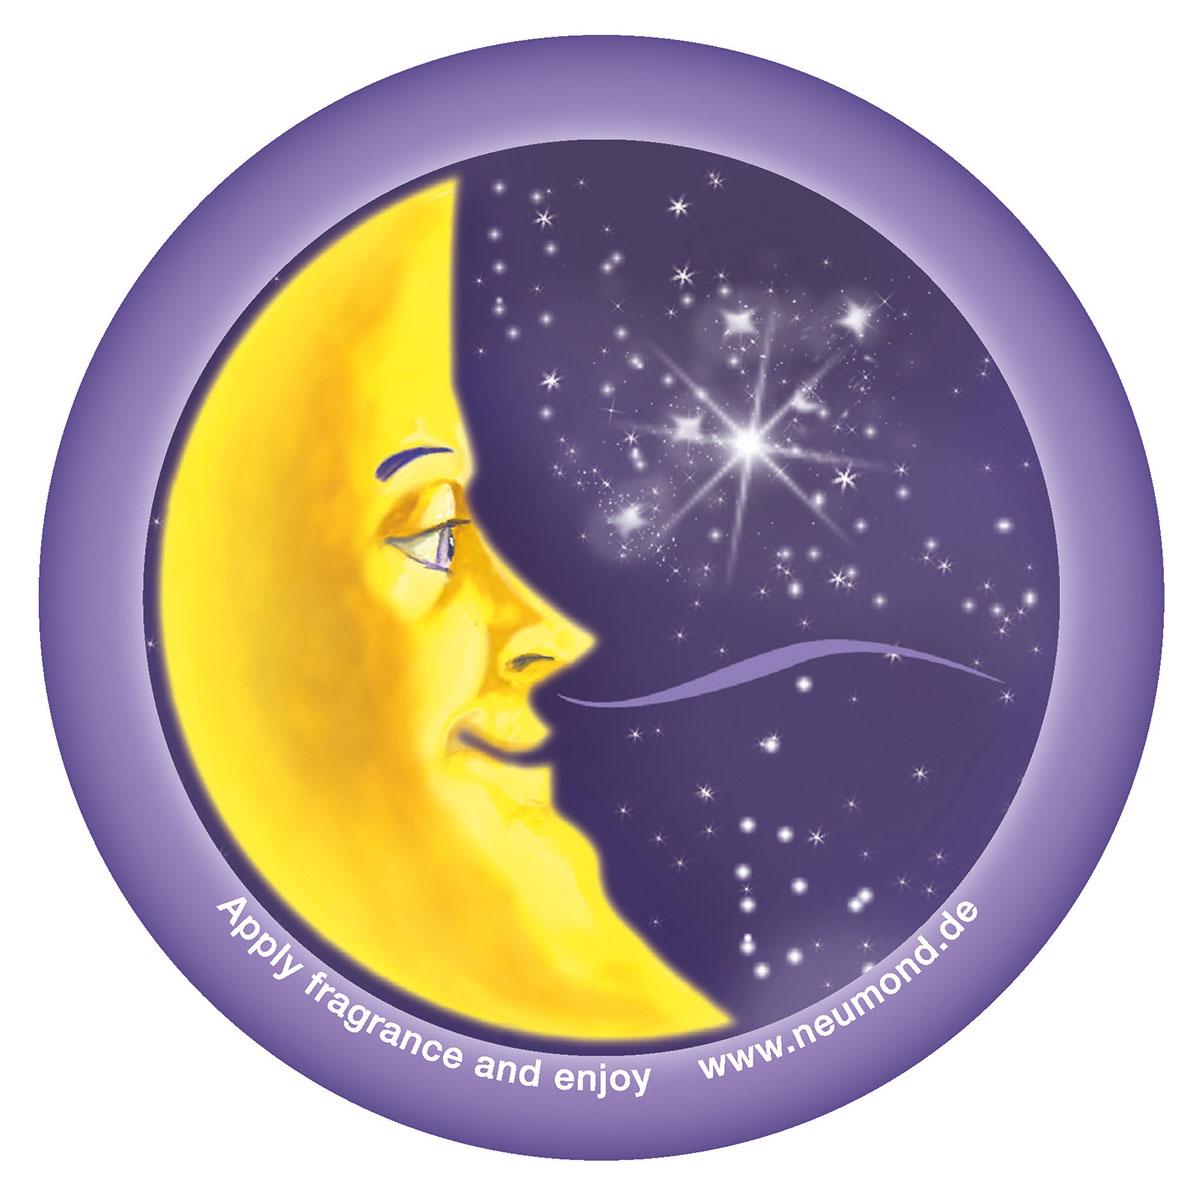 Duft-Vlies Mond mit Kordel, 10er-Pack, 1Pk.